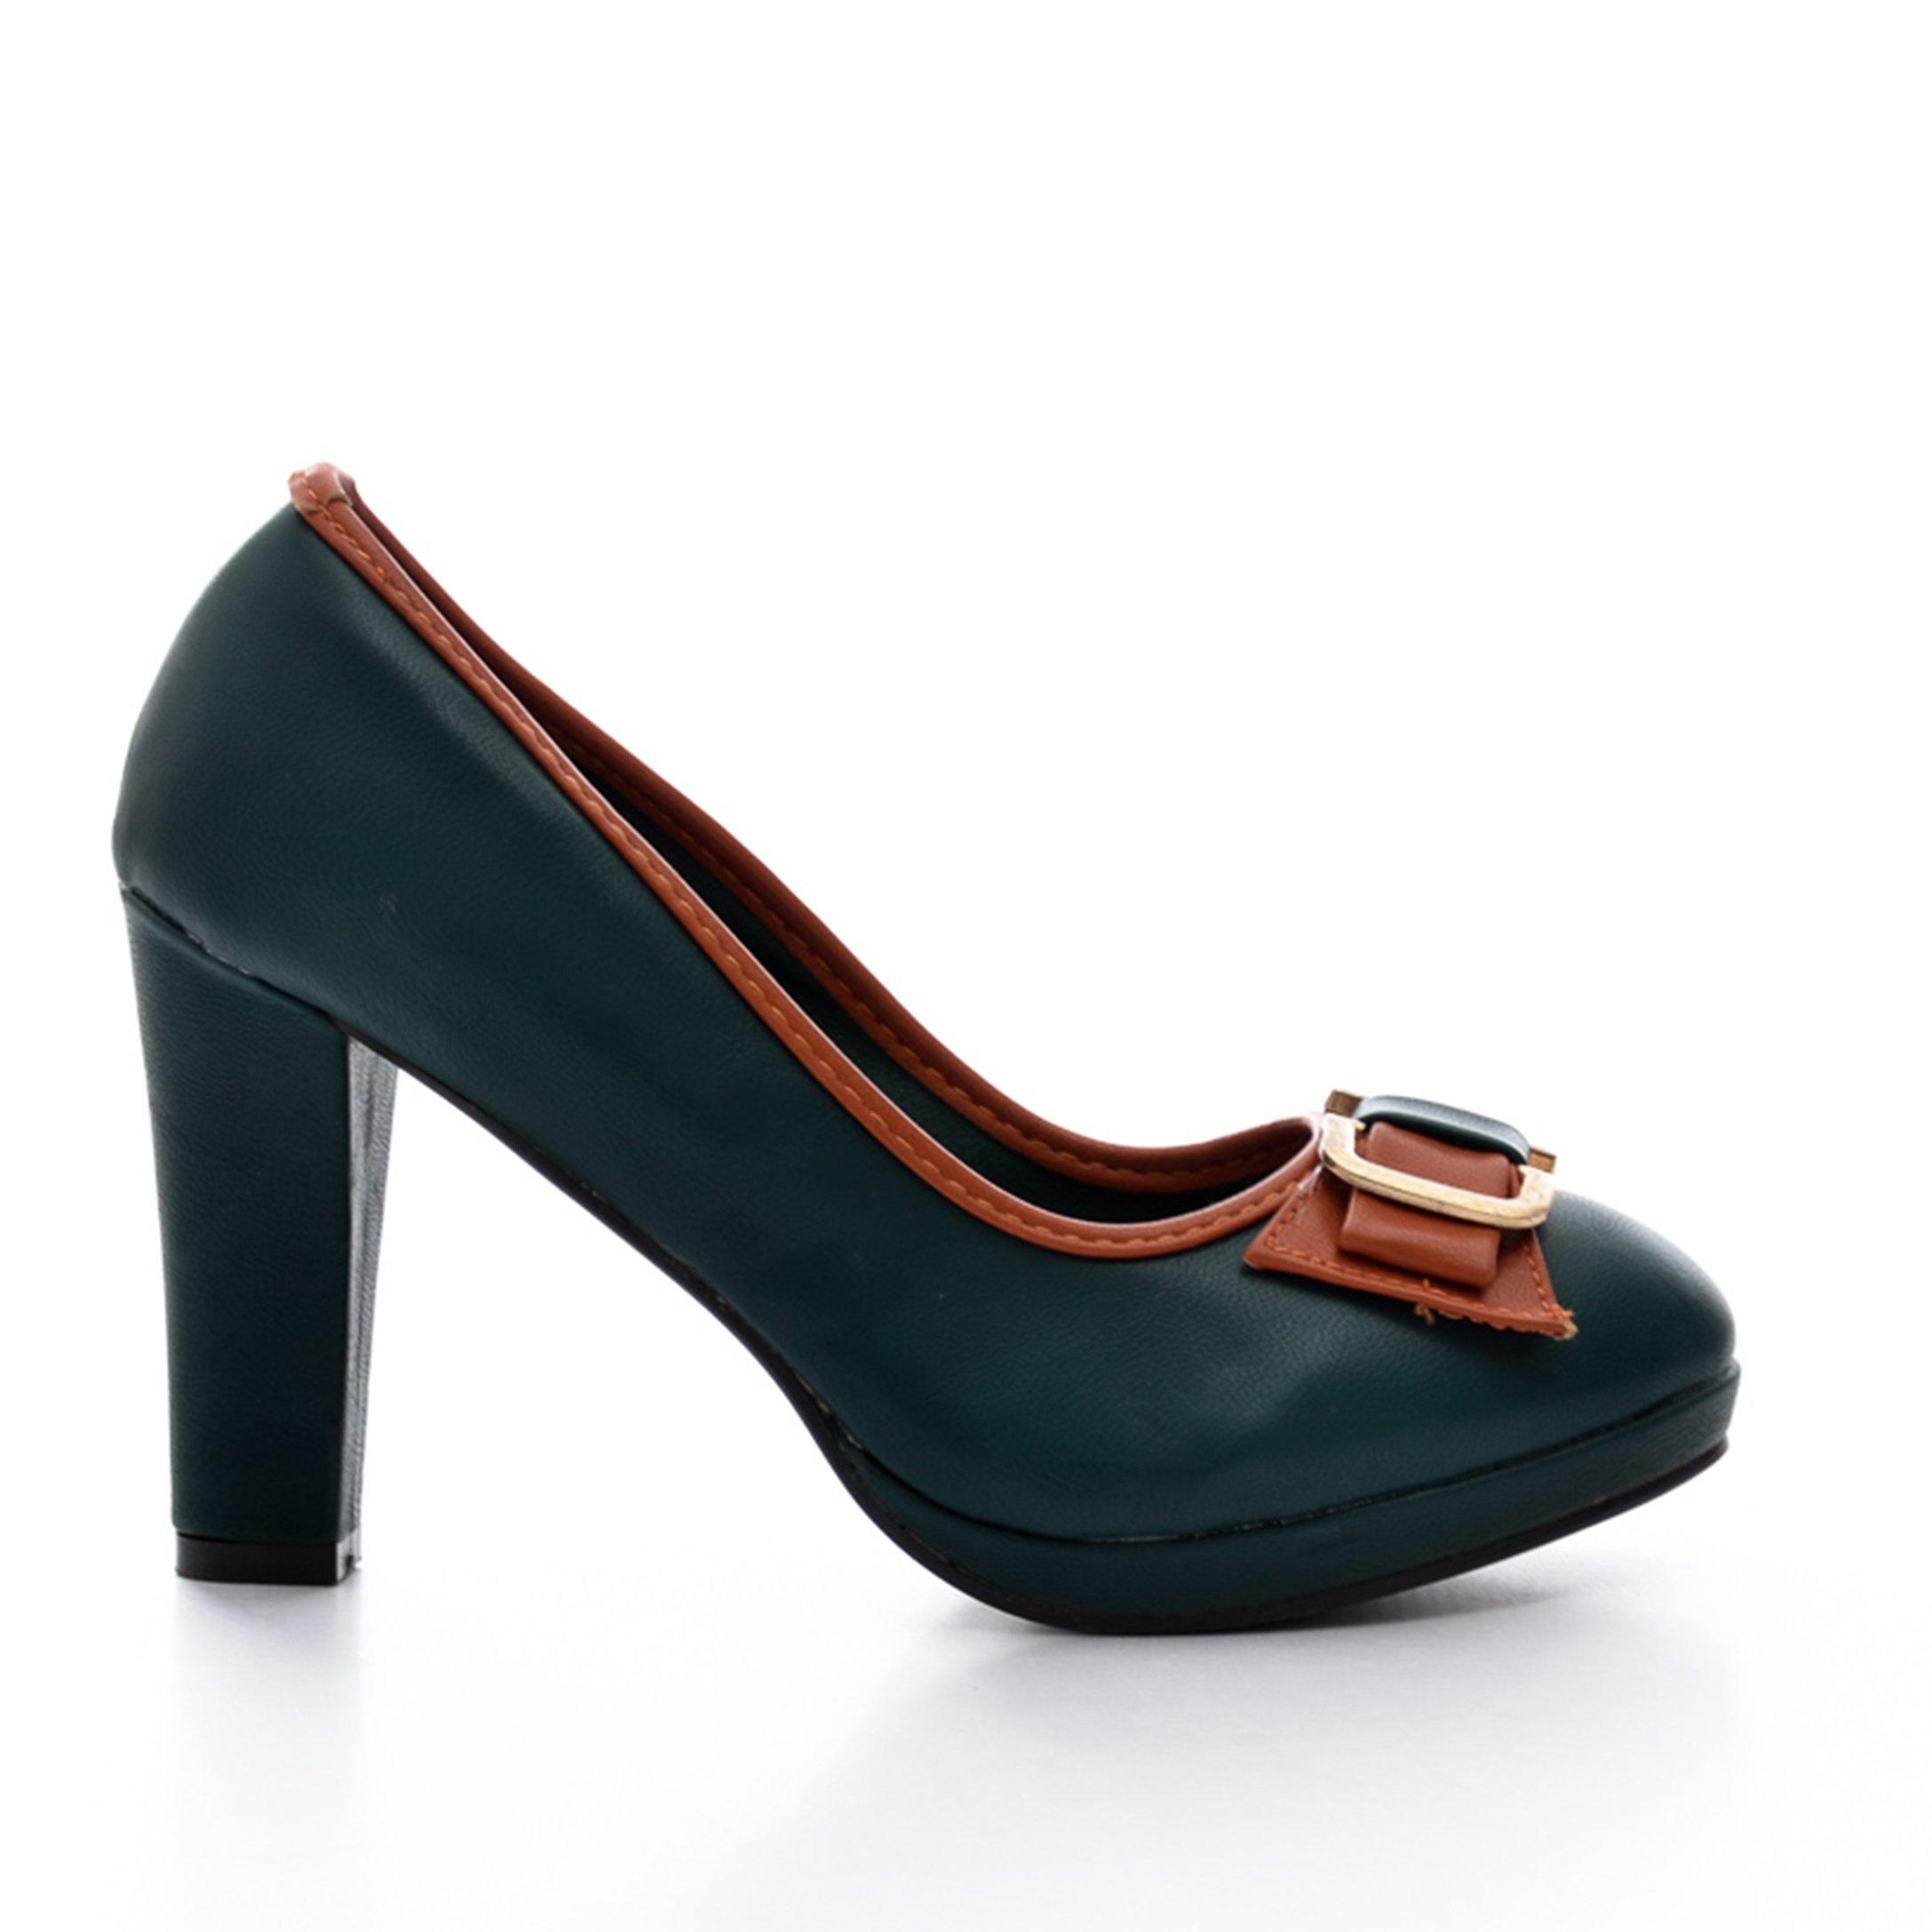 Pantofi dama Isolde verzi